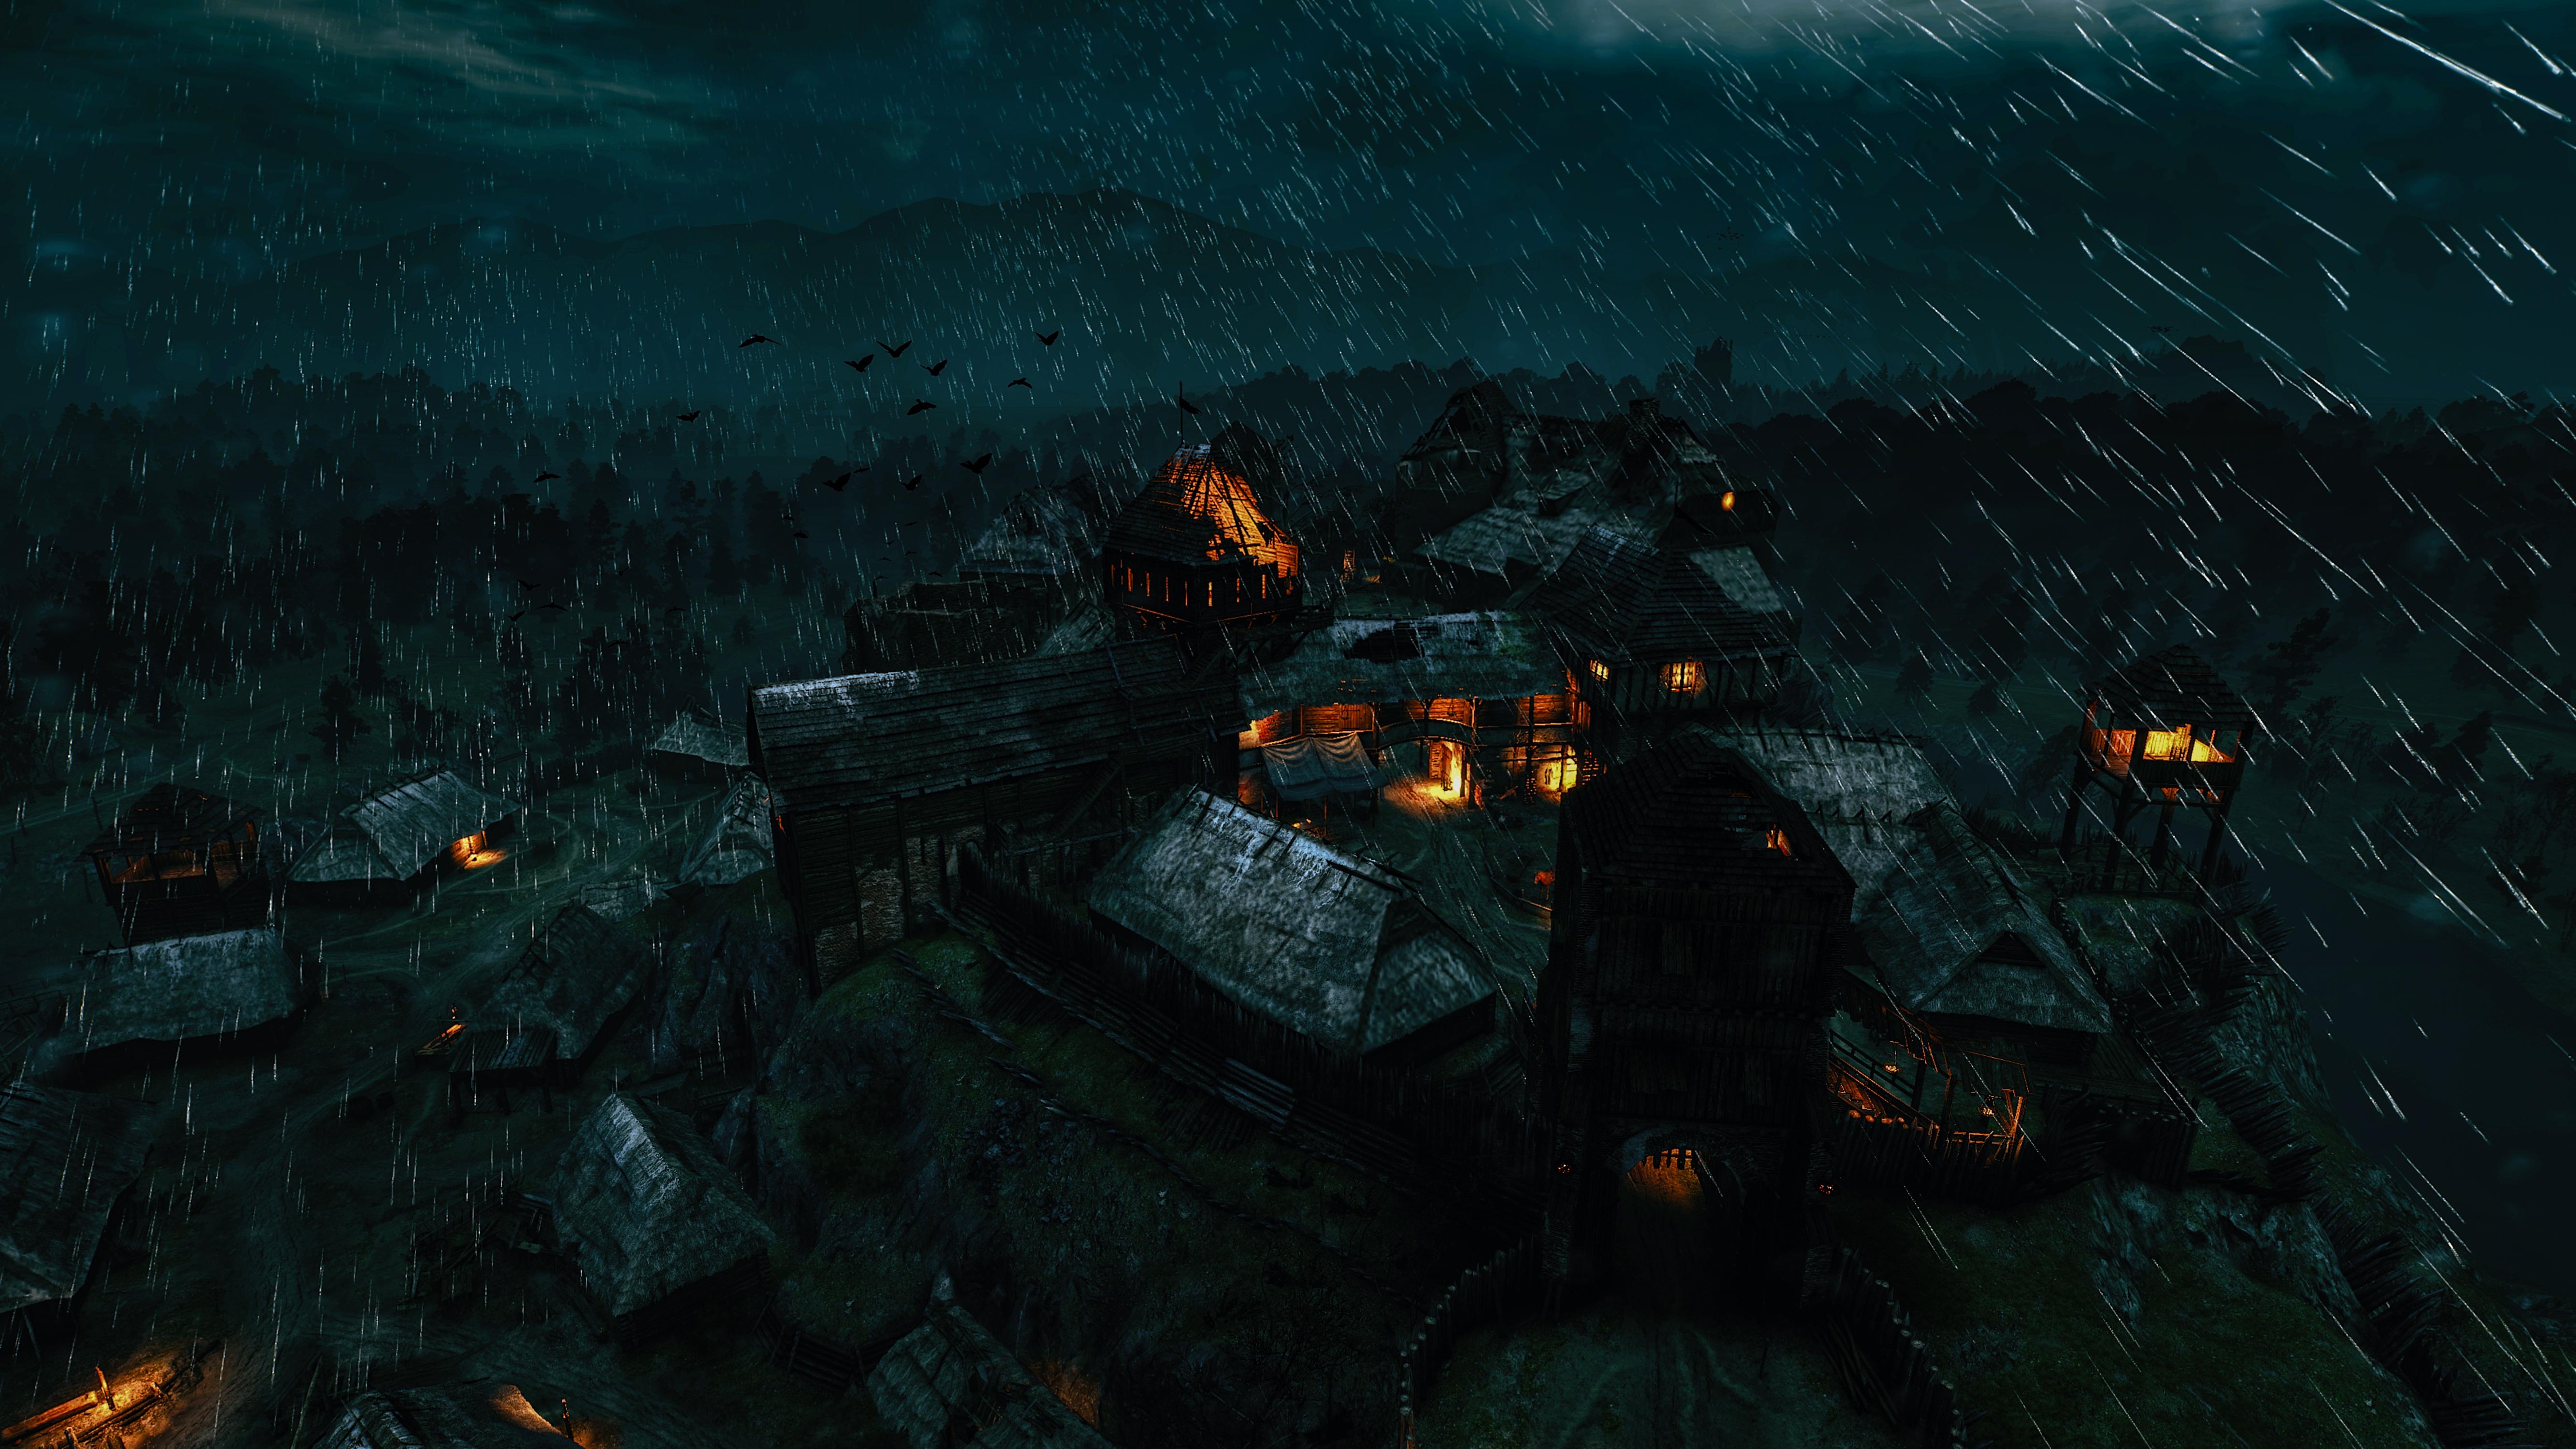 Wallpaper : The Witcher 3 Wild Hunt